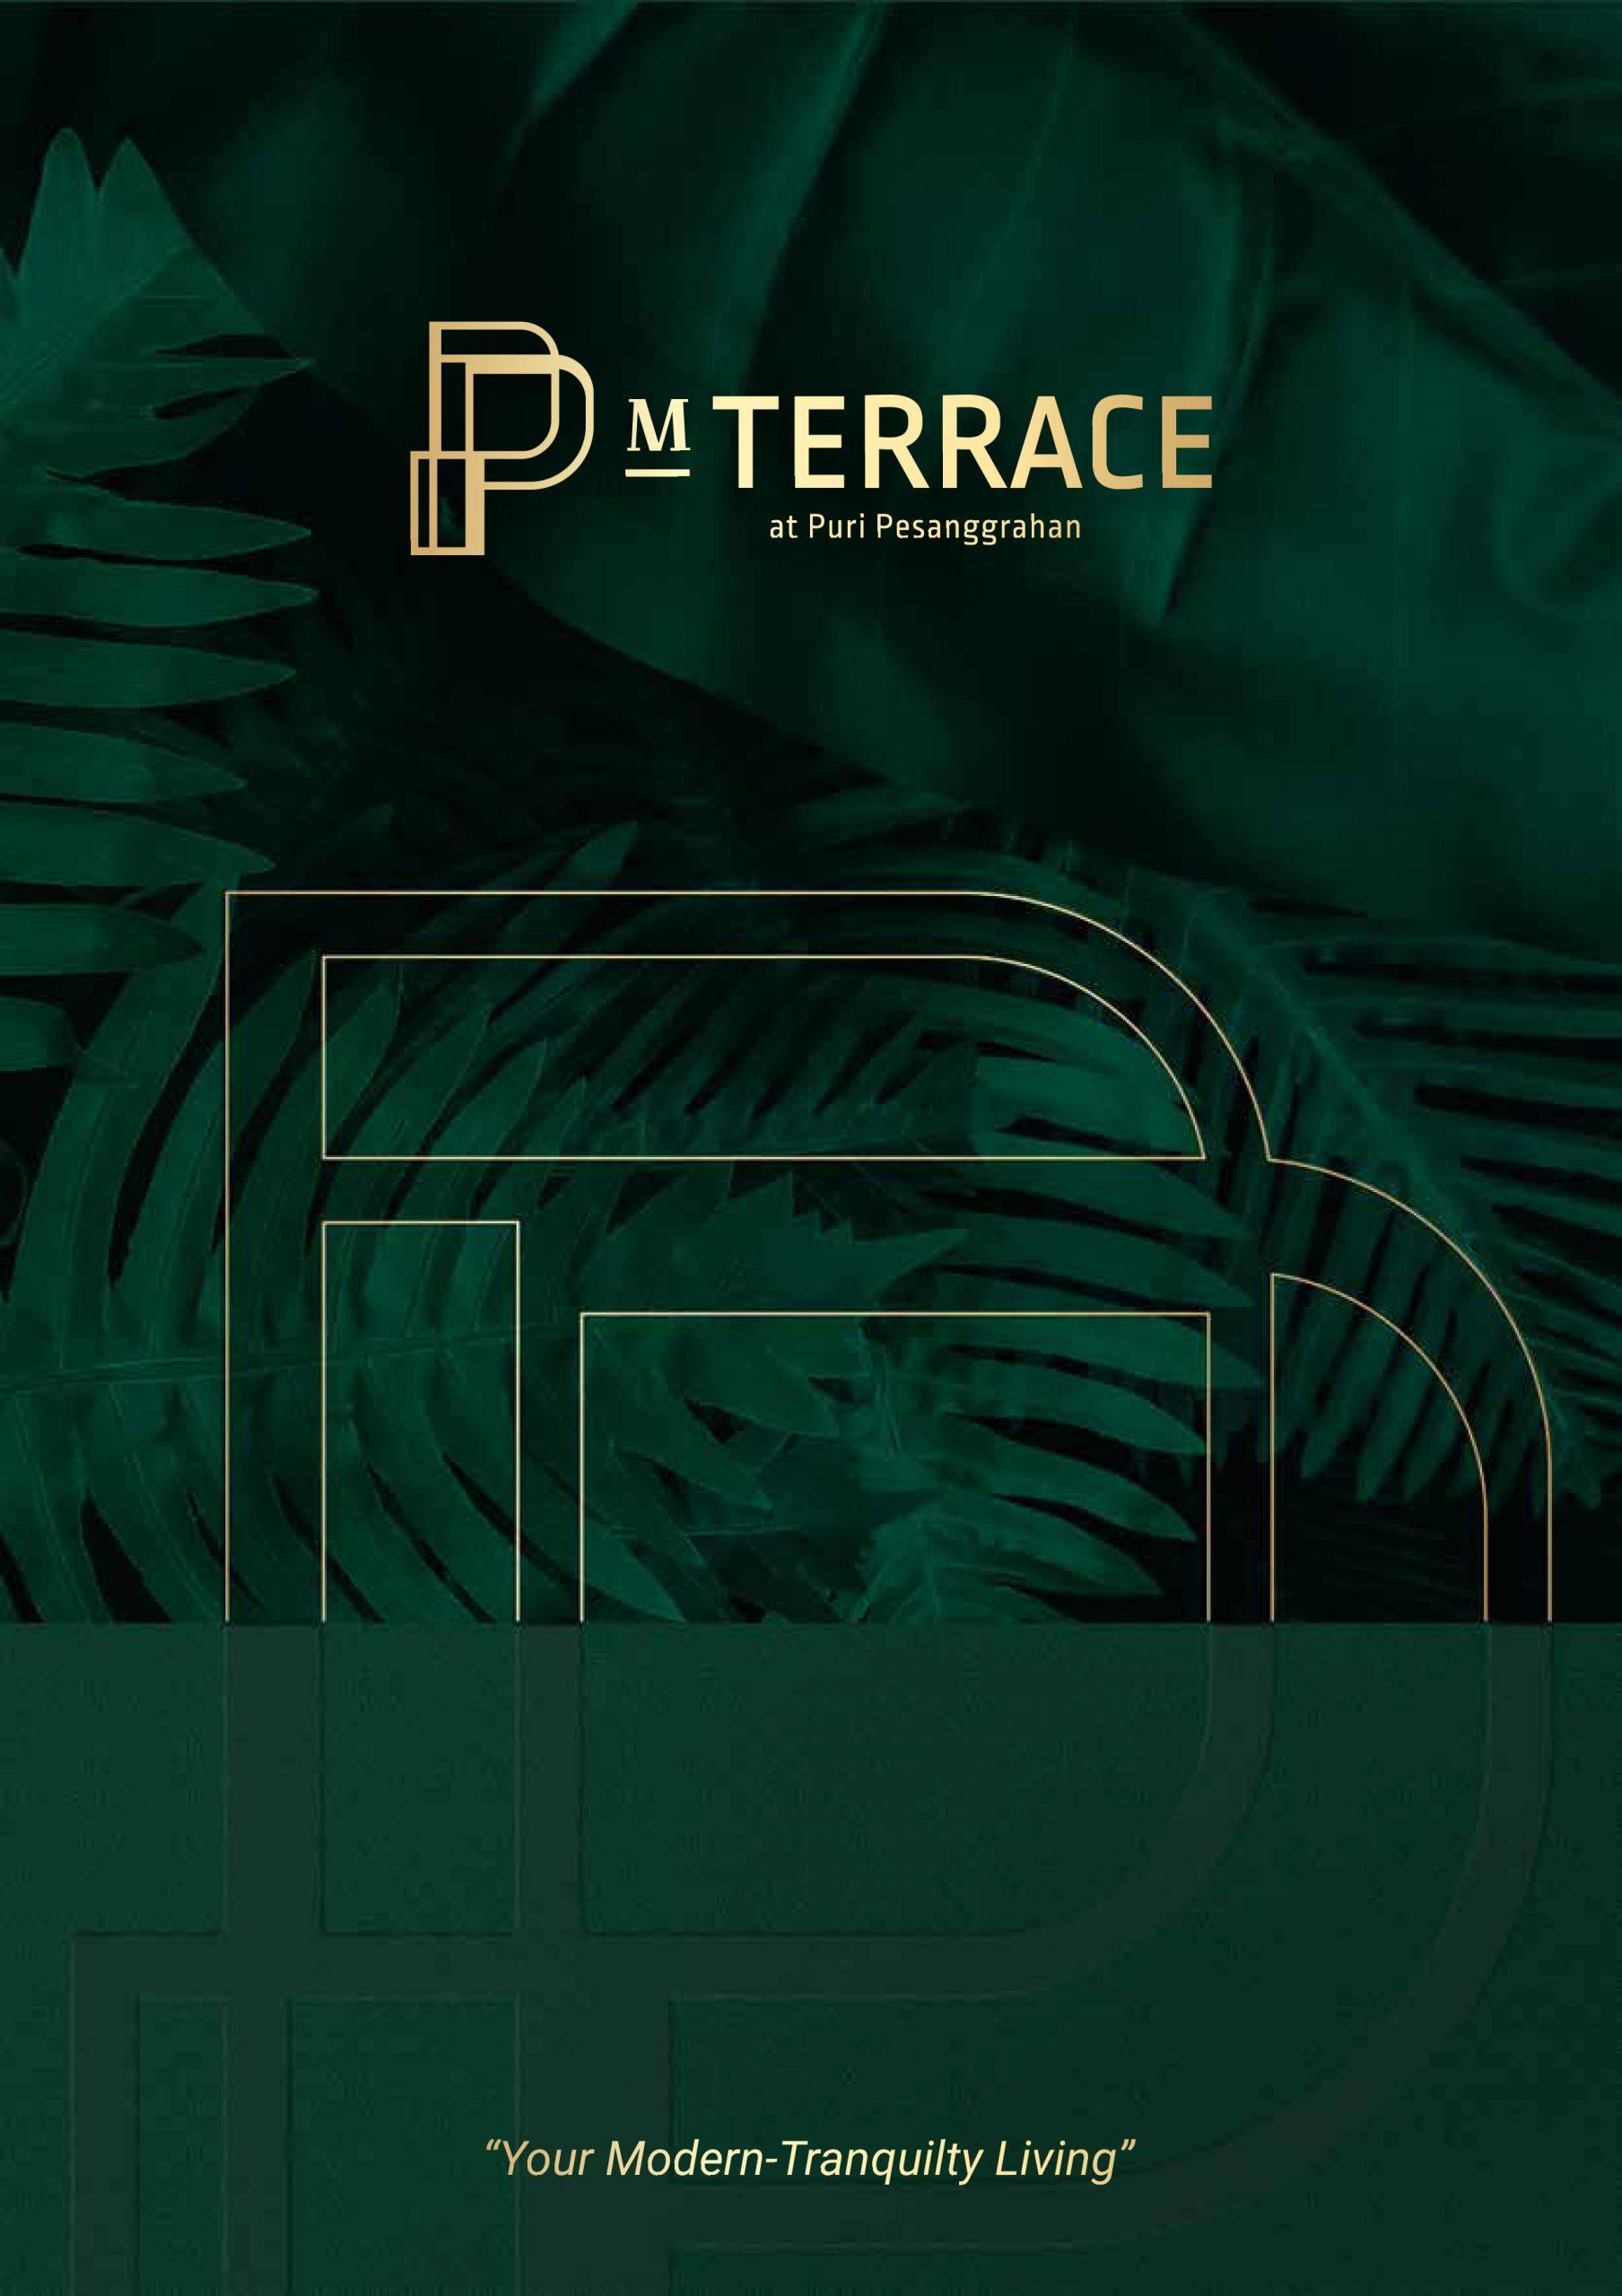 M Terrace Marketing 08111229182